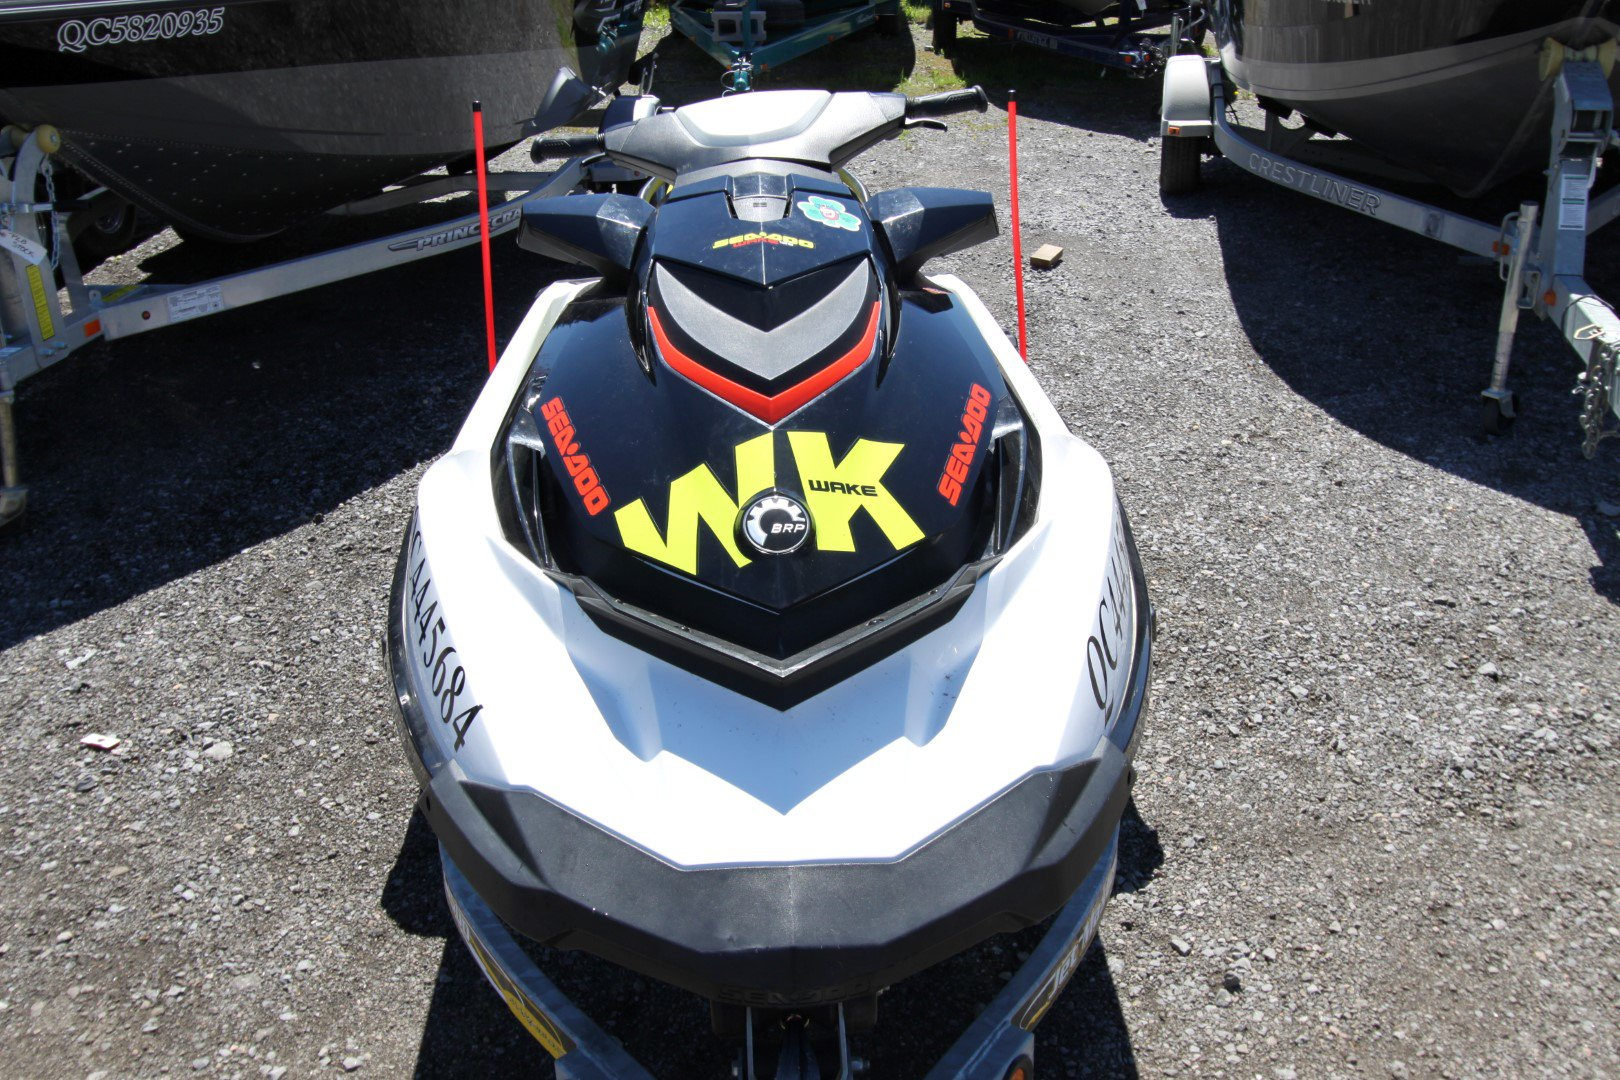 BRP Sea doo GTX 155 WAKE - IMG_2883